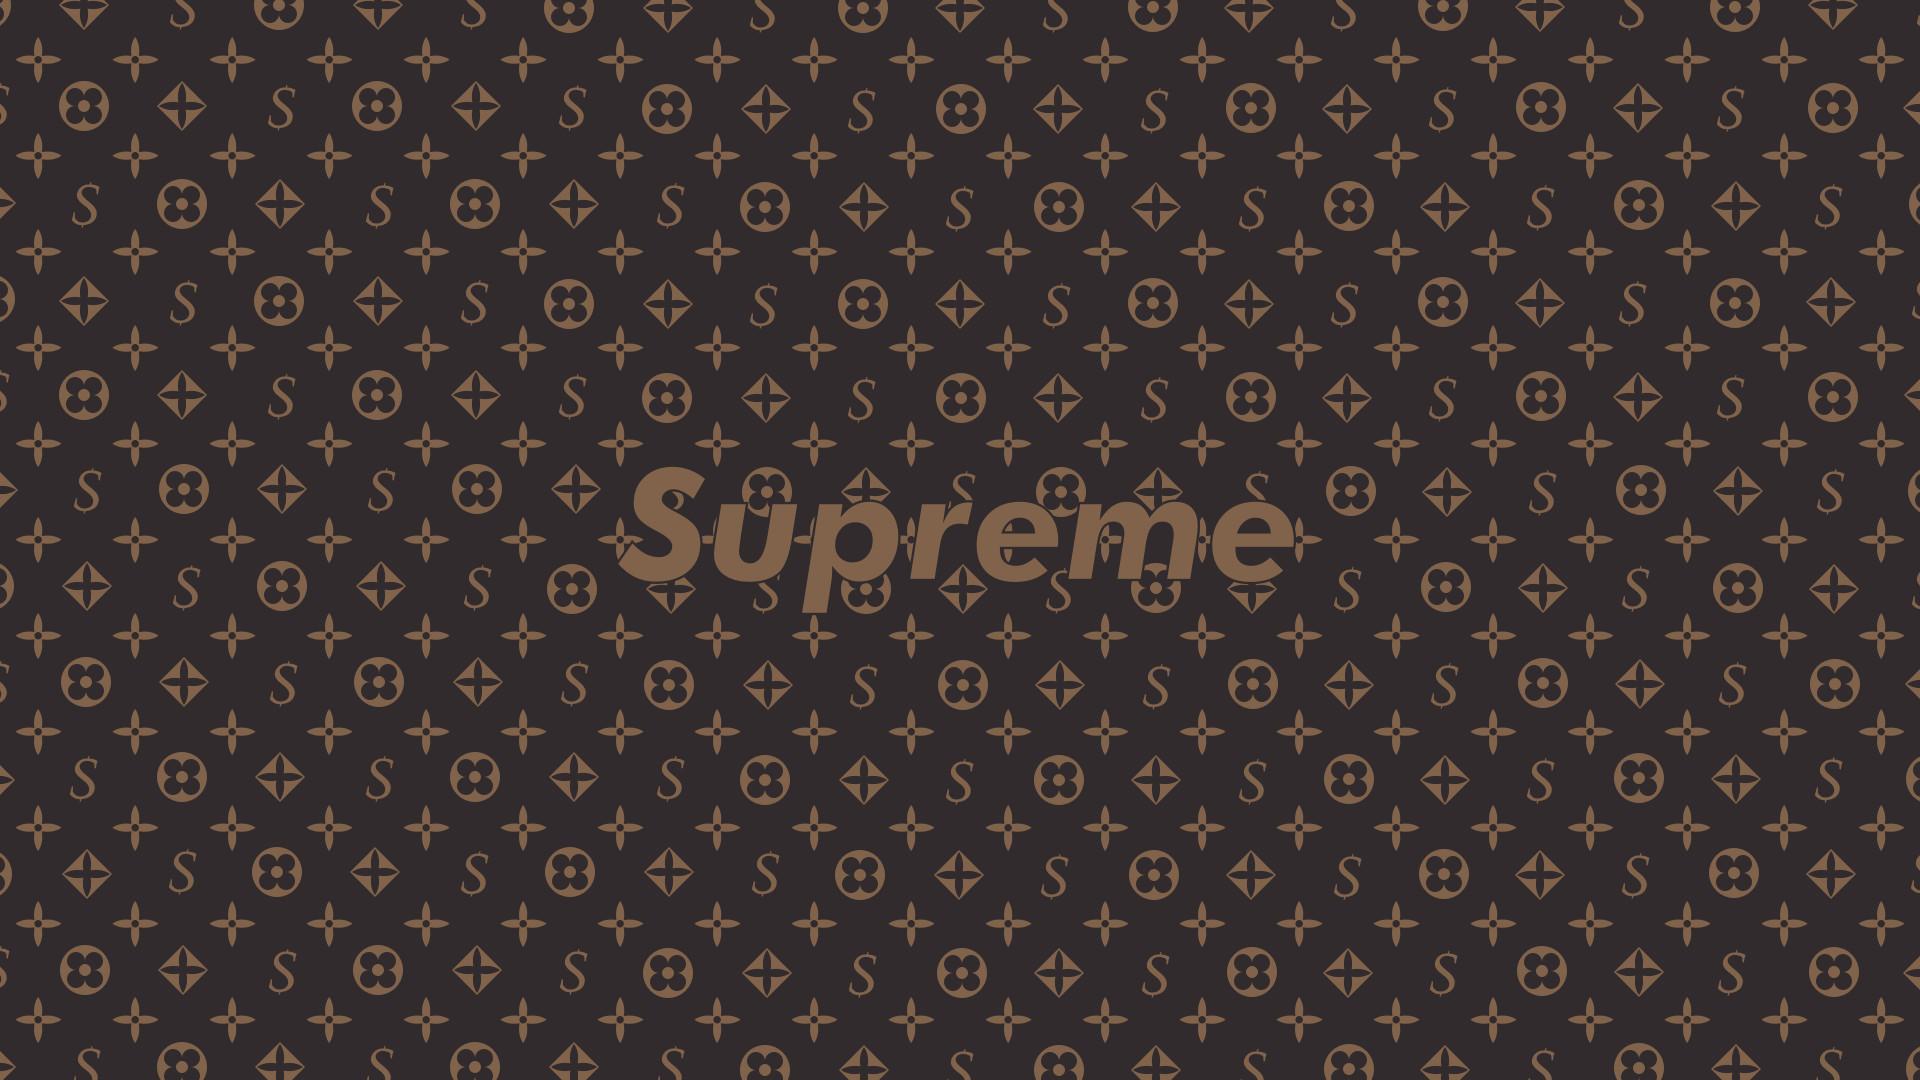 Some Supreme x LV Wallpapers I made